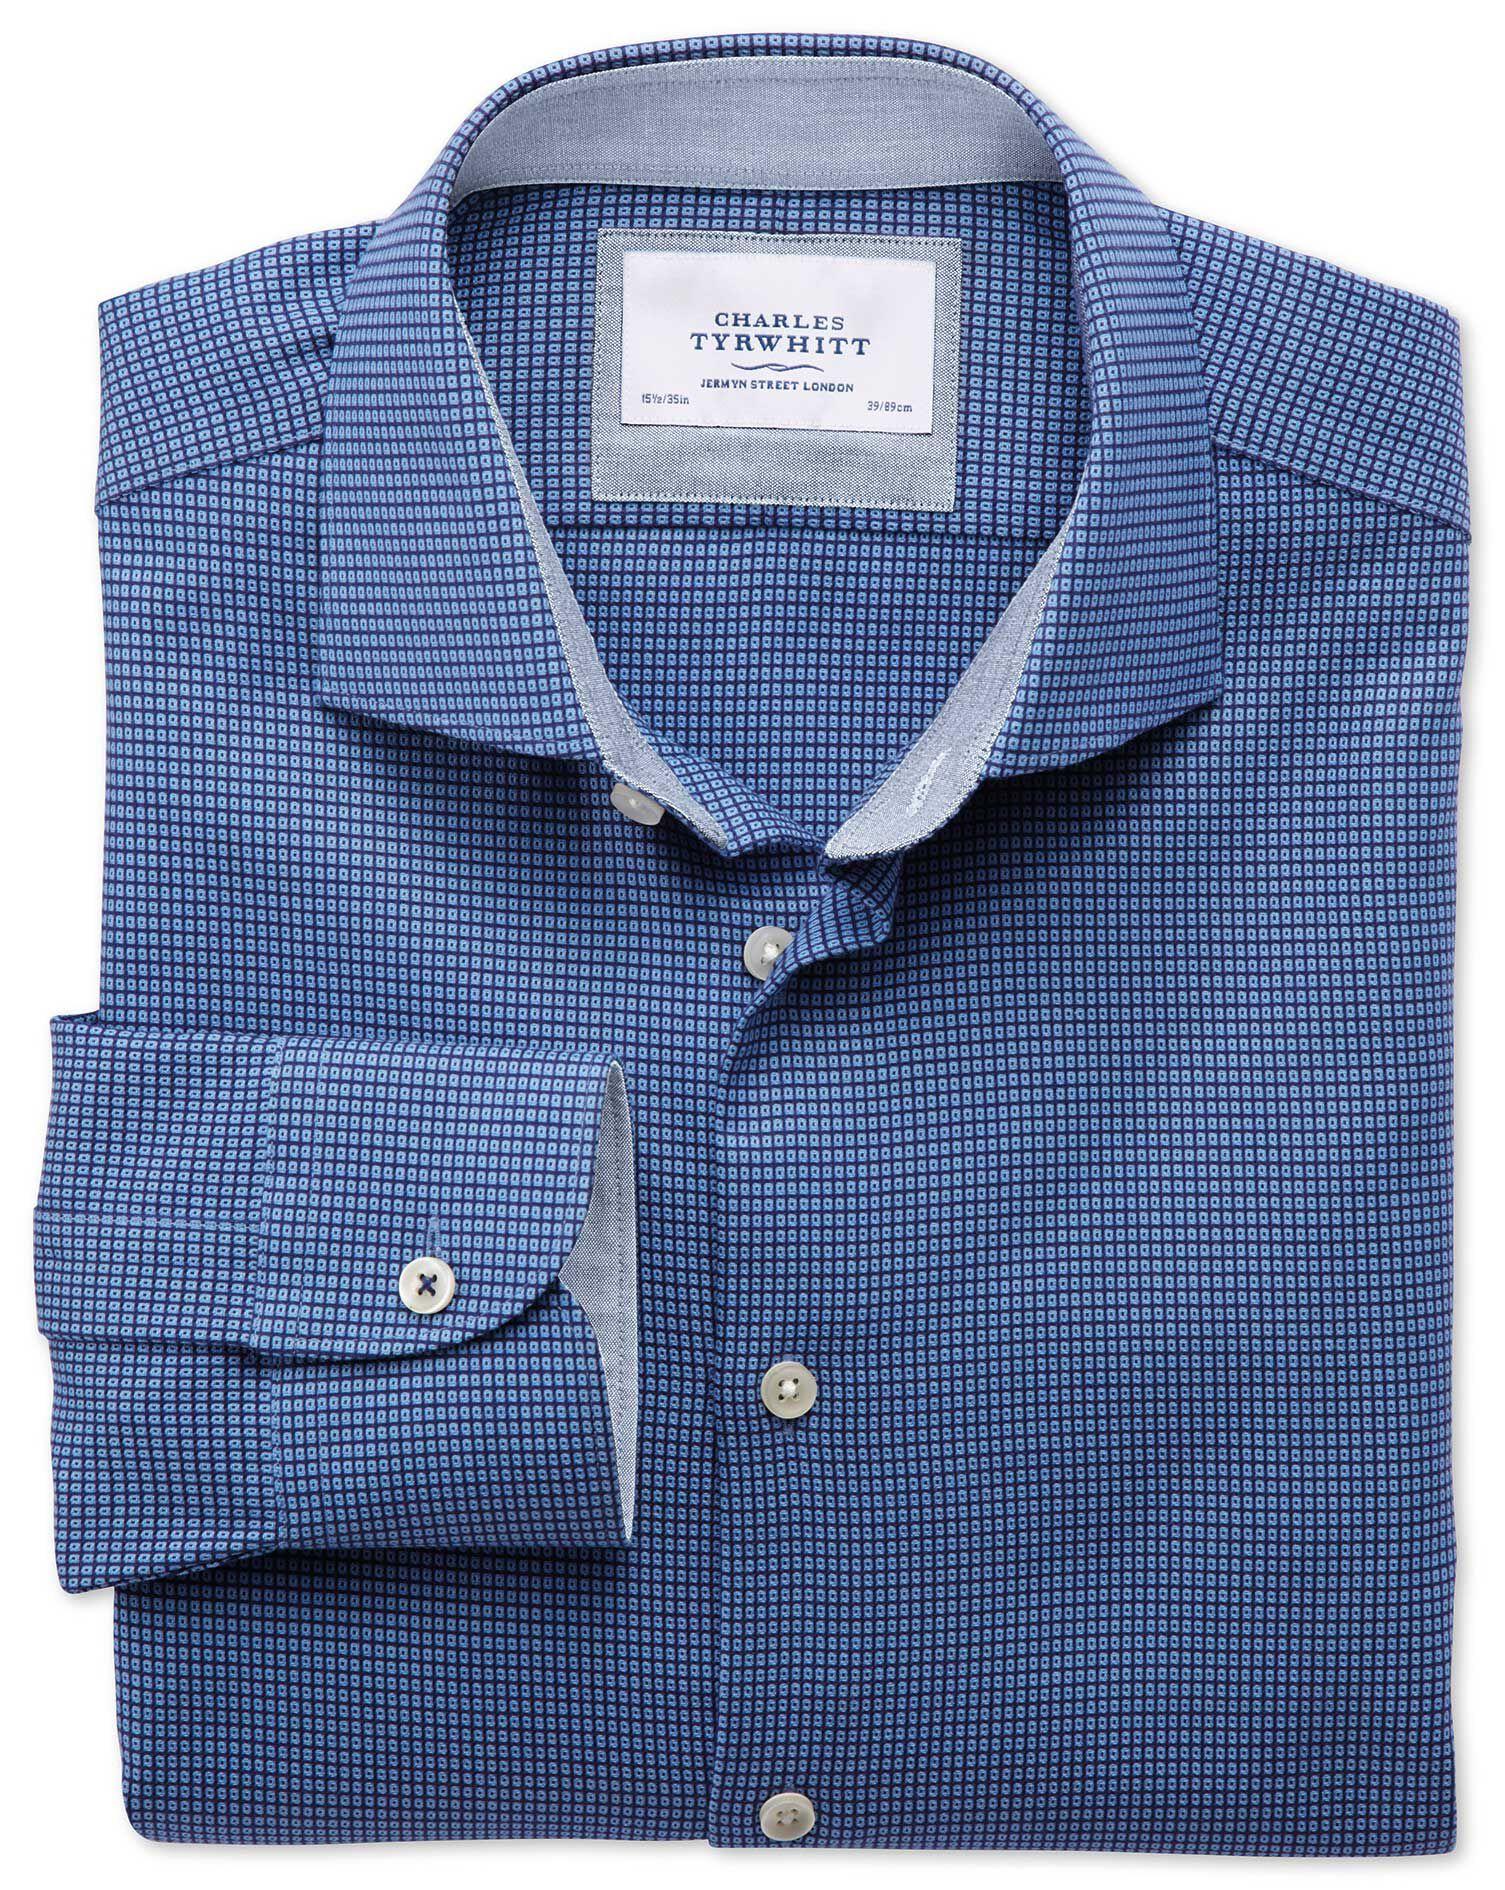 Extra Slim Fit Semi-Cutaway Collar Business Casual Textured Royal Blue Cotton Formal Shirt Single Cu